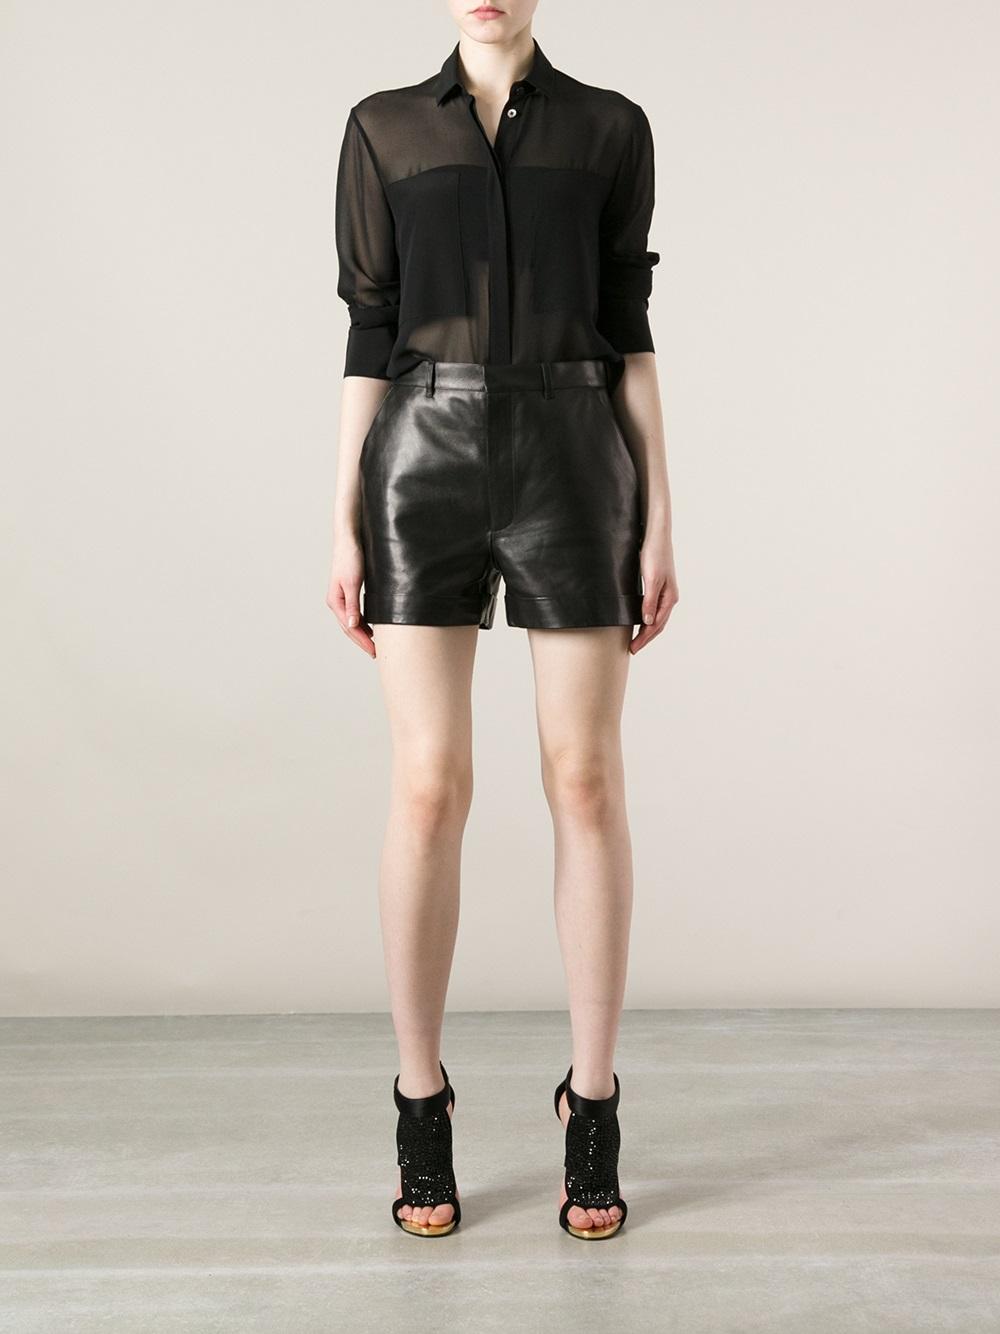 Saint Laurent Leather Shorts - Luisa World - Farfetch.com